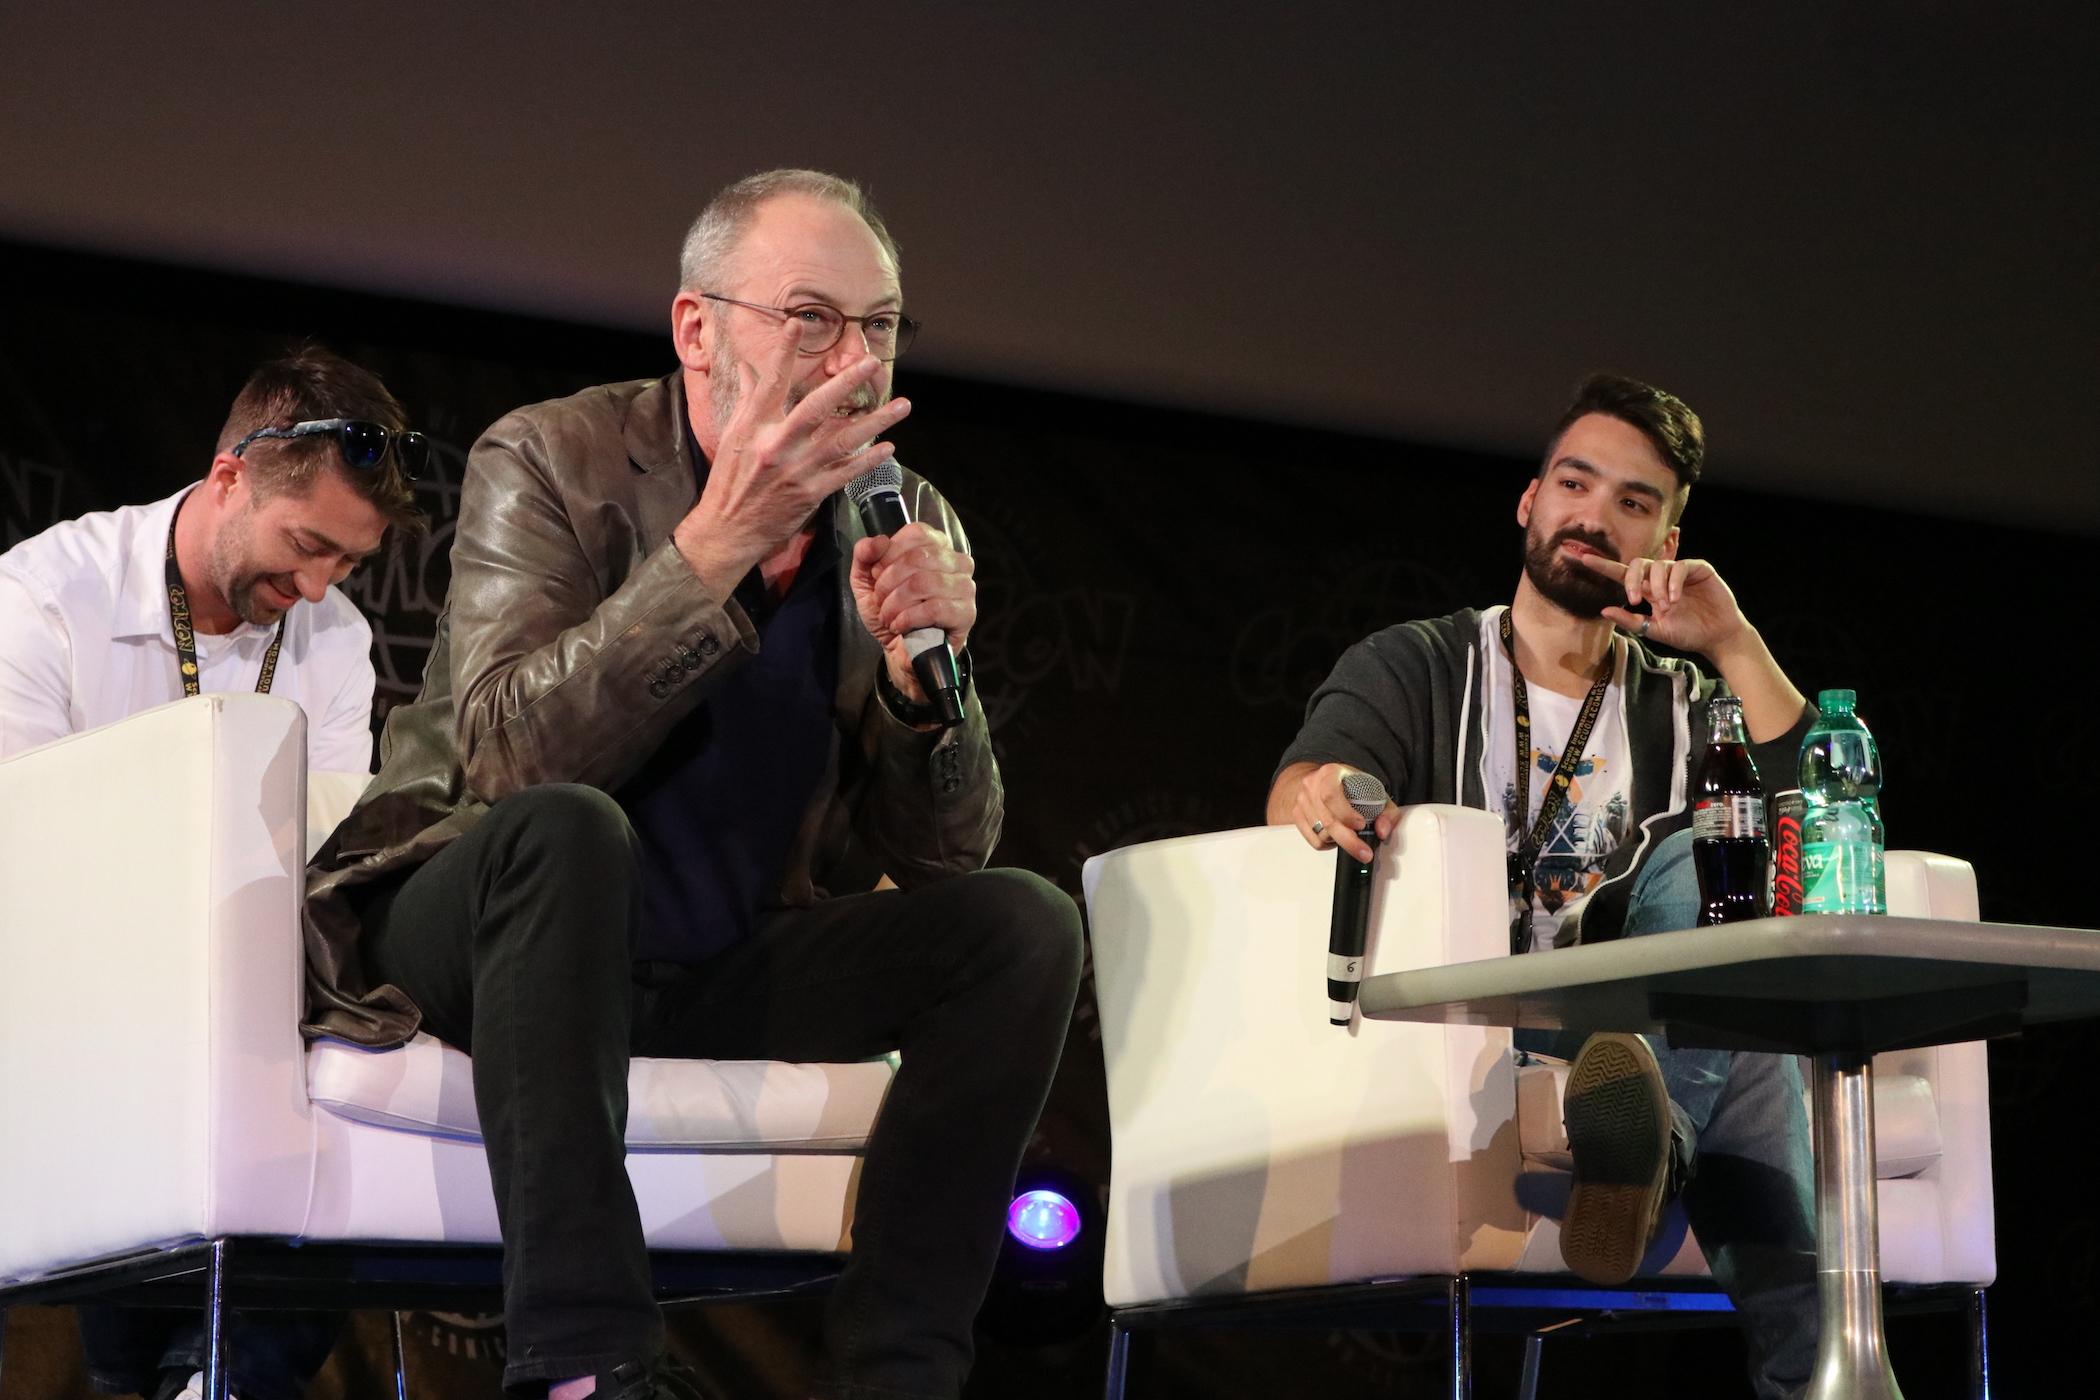 Comicon 2017: Liam Cunningham risponde alle domande